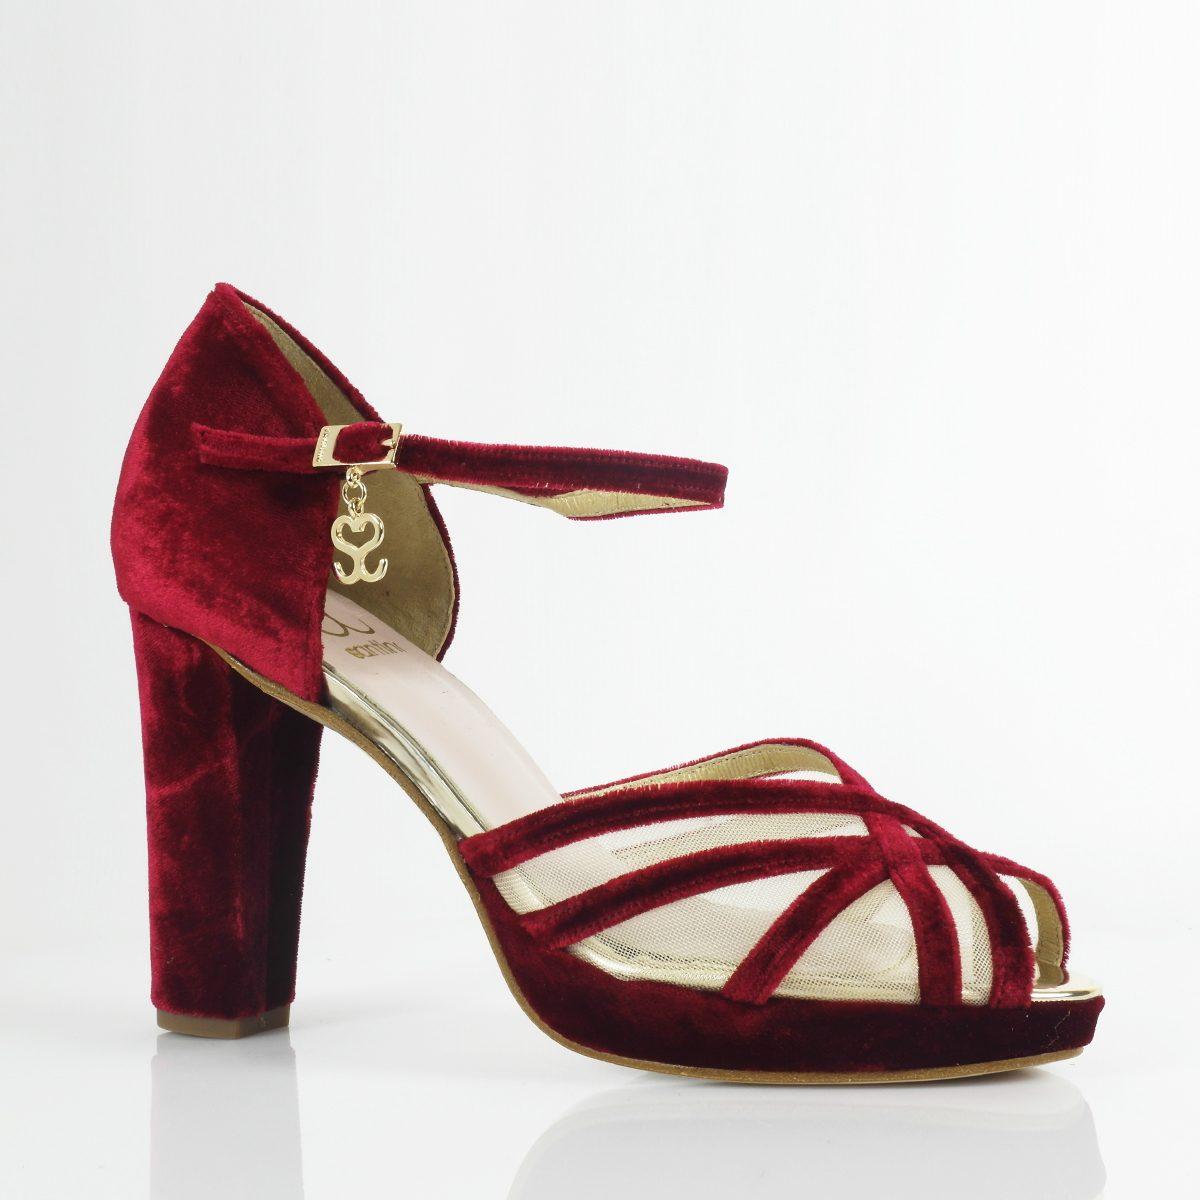 SANDALIA MOD.9639 (10cm) - Zapatos Personalizados Fiesta